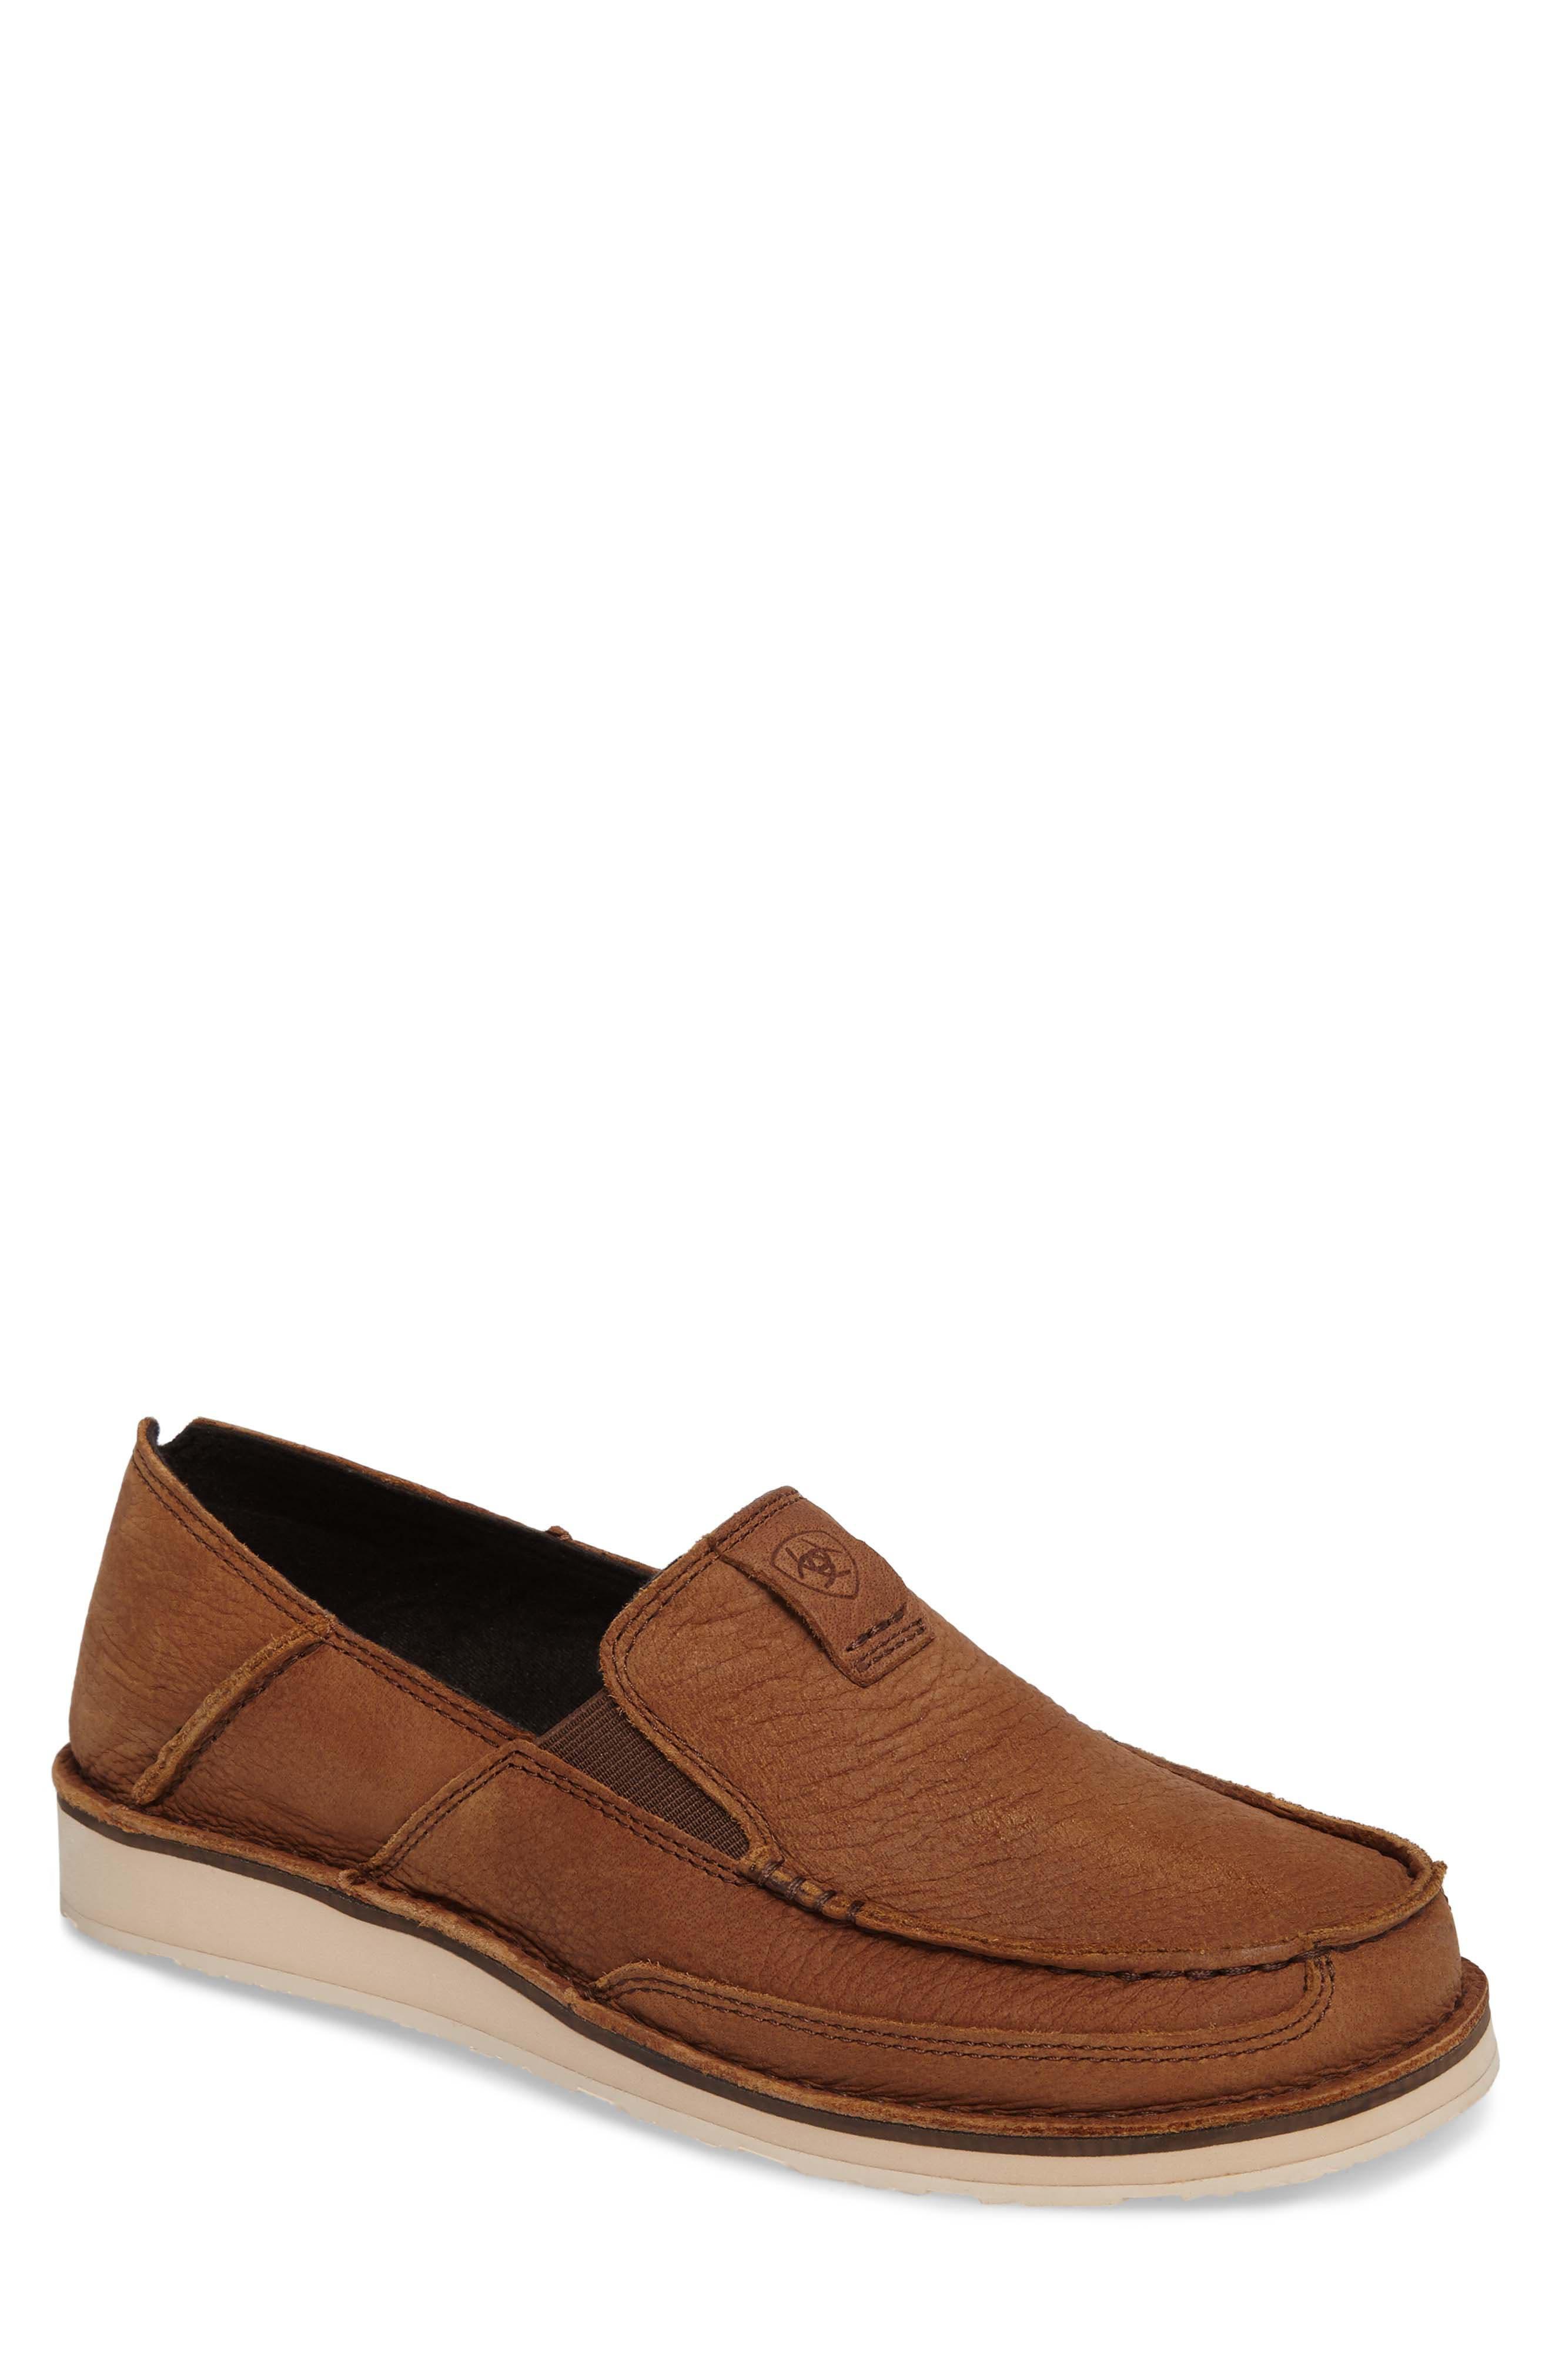 'Cruiser' Slip-On,                         Main,                         color, Aged Bark Leather